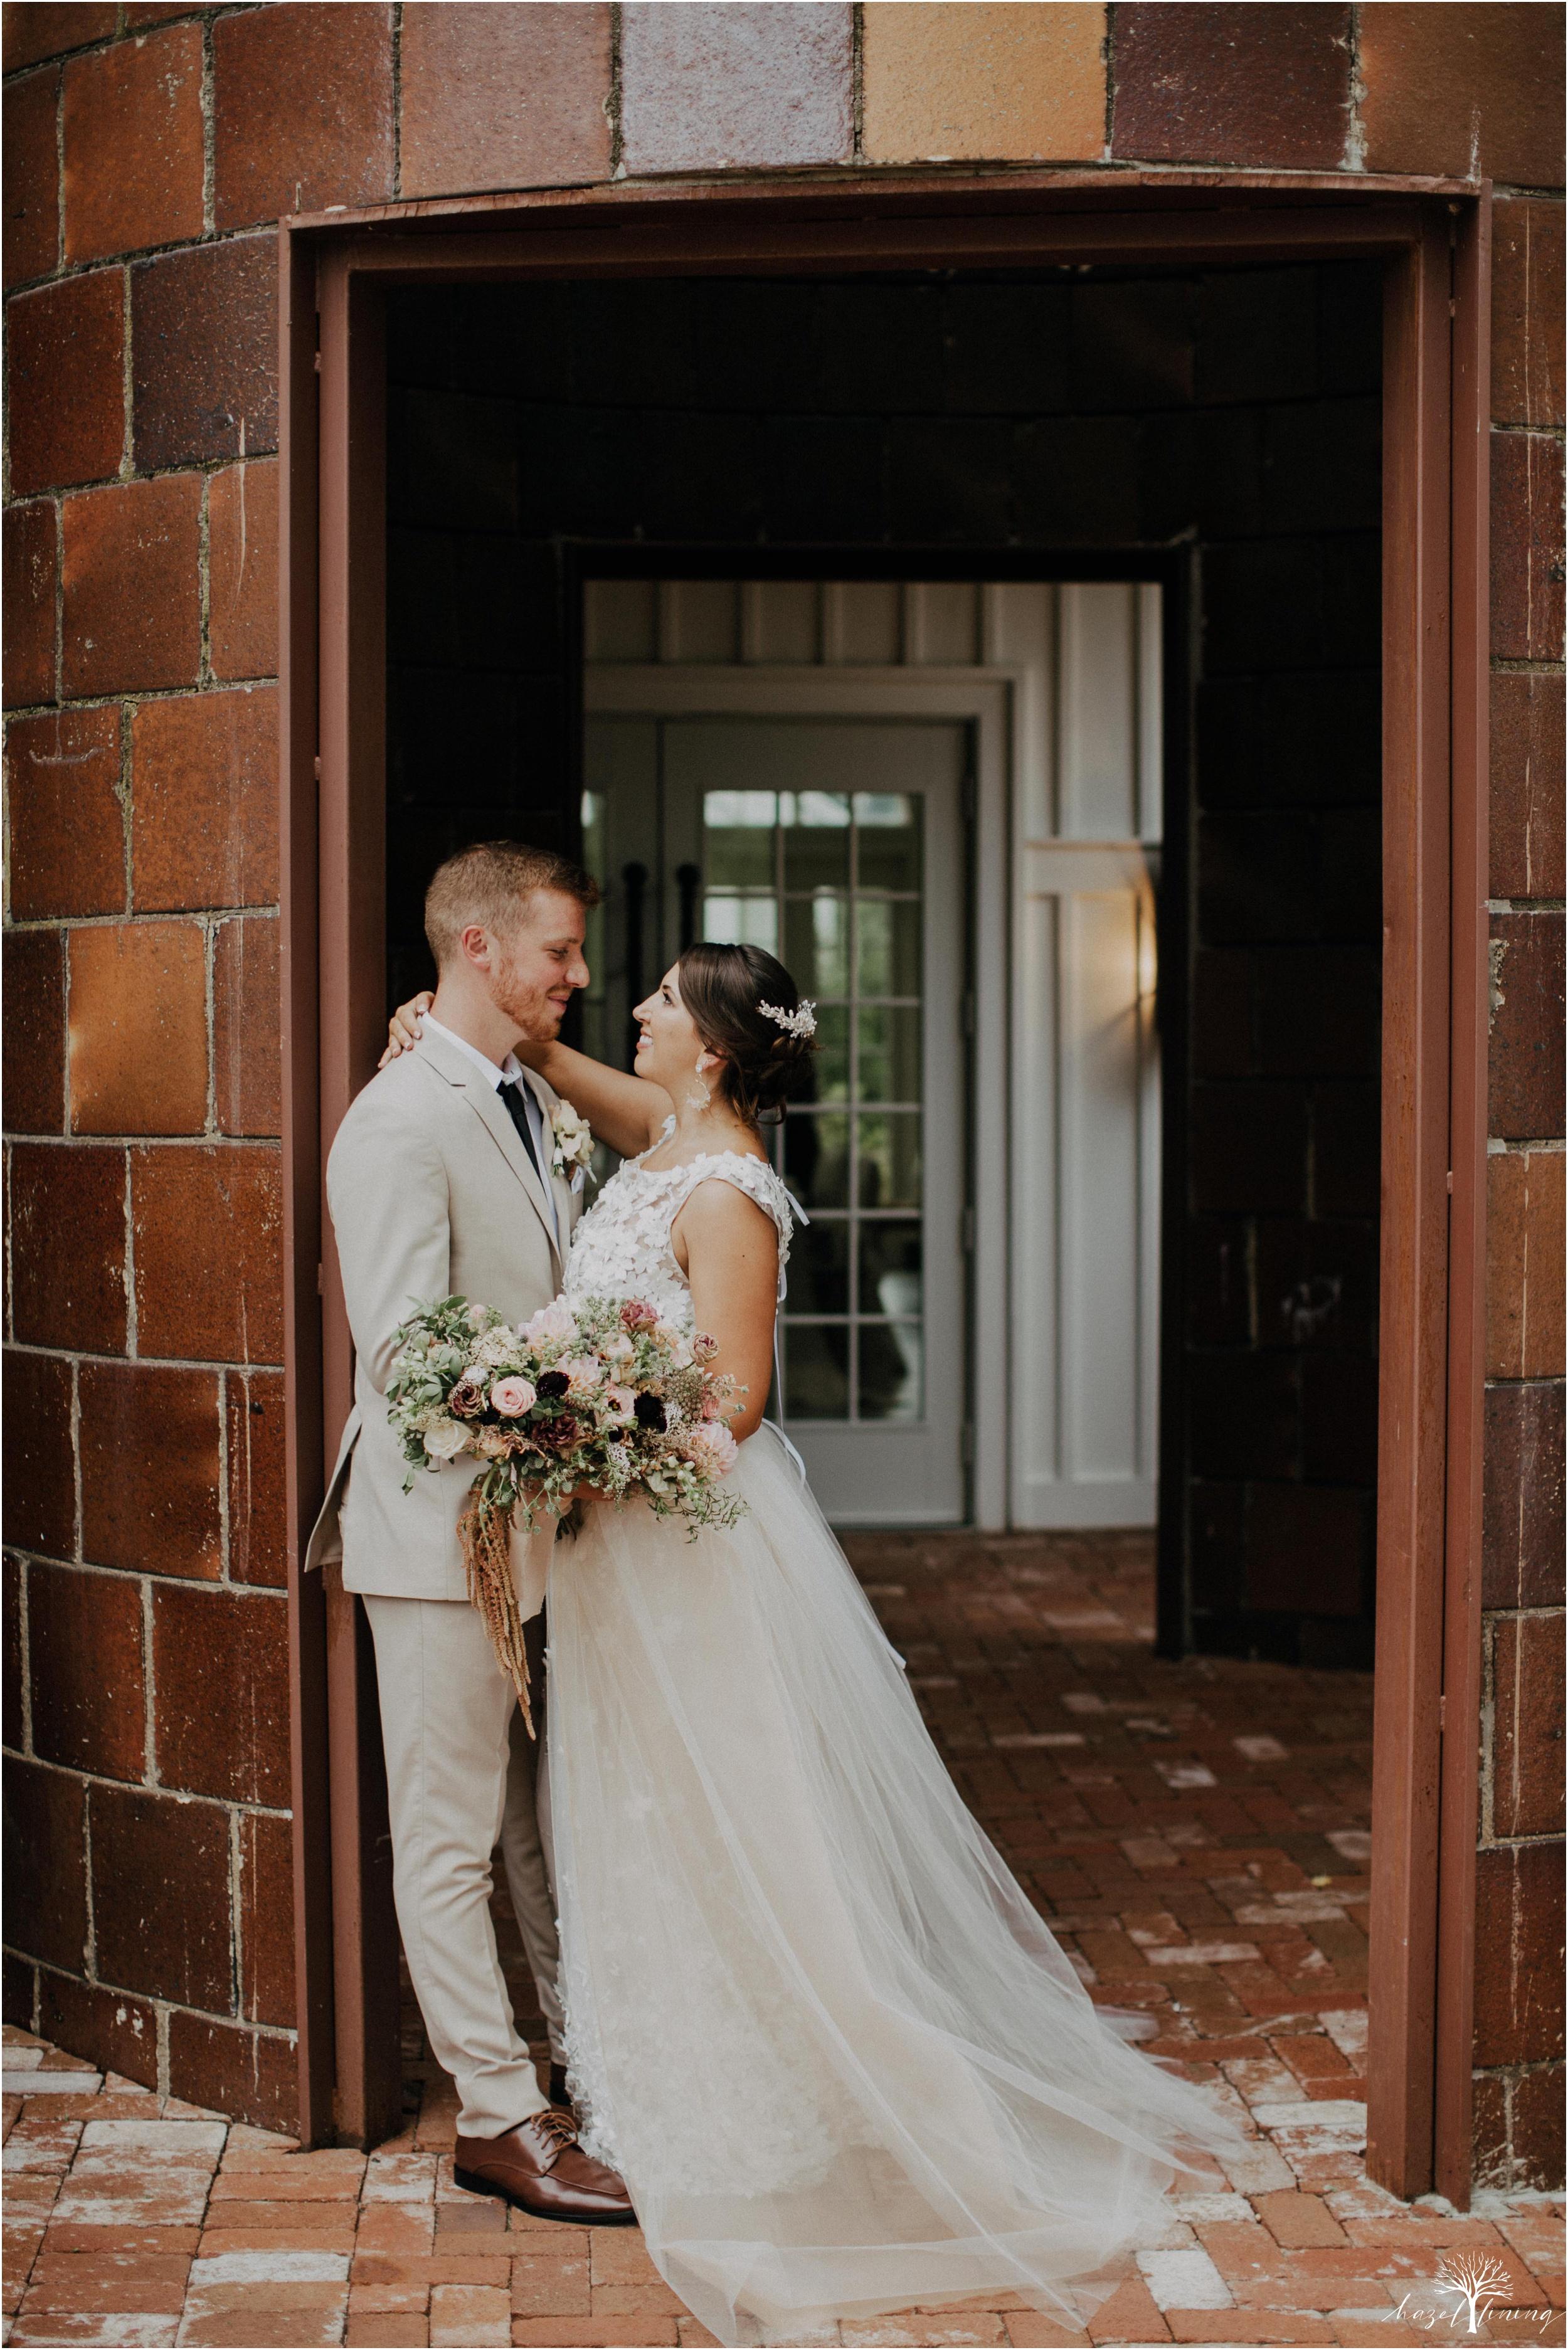 carl-chloe-the-ryland-inn-whitehouse-station-new-jersey-styled-squad-hazel-lining-photography-destination-elopement-wedding-engagement-photography_0015.jpg